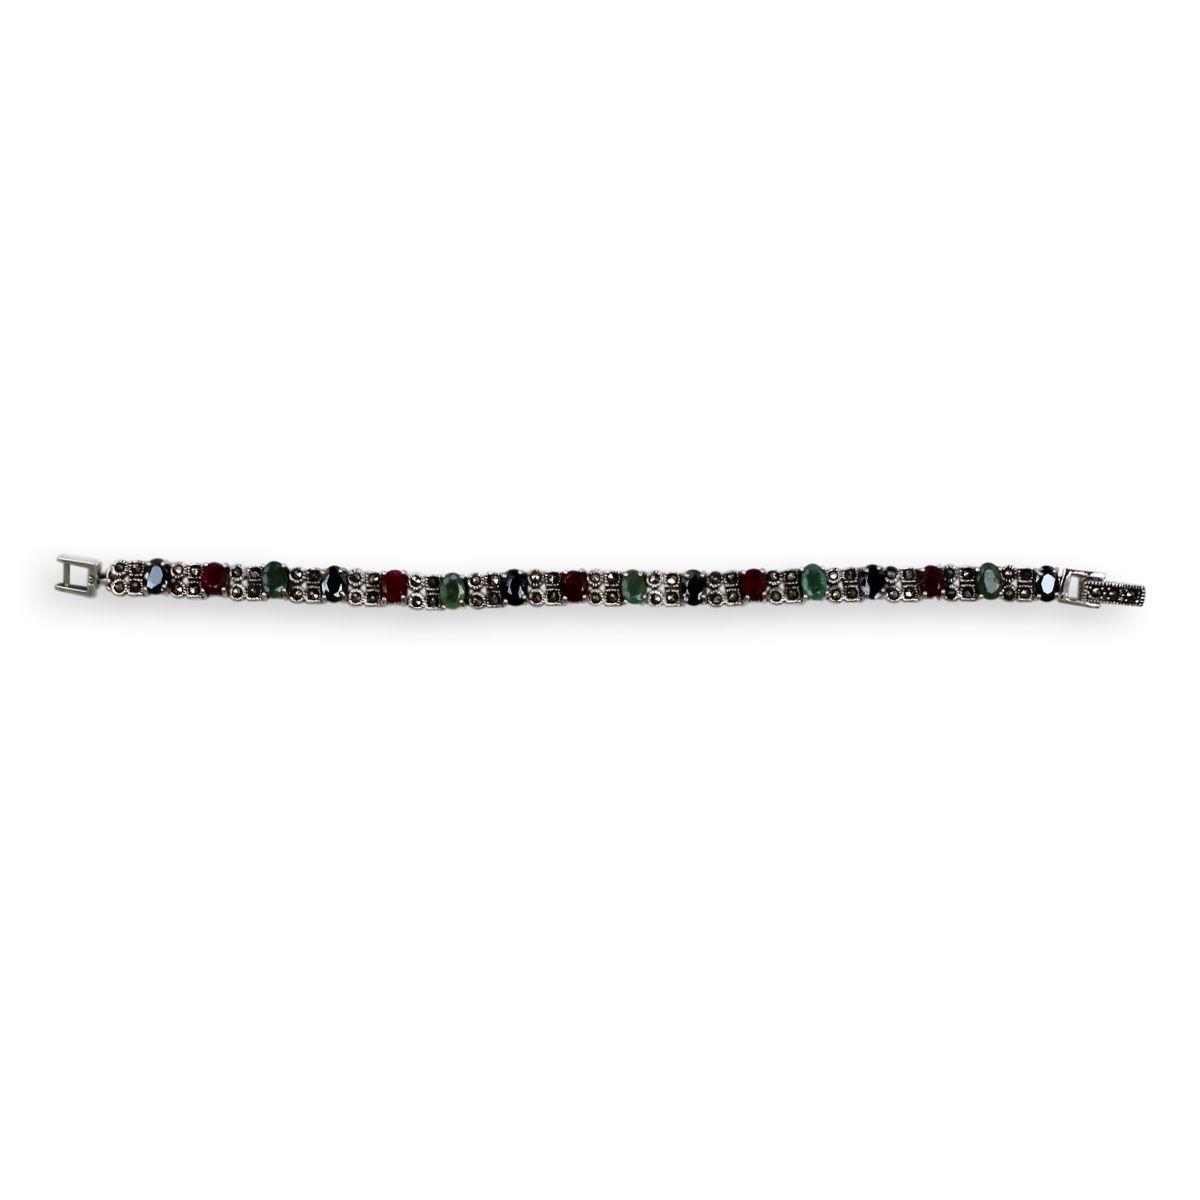 Pulseira Díspar 2138 Rubi, Esmeralda, Safira e Marcassitas 18 cm - Prata